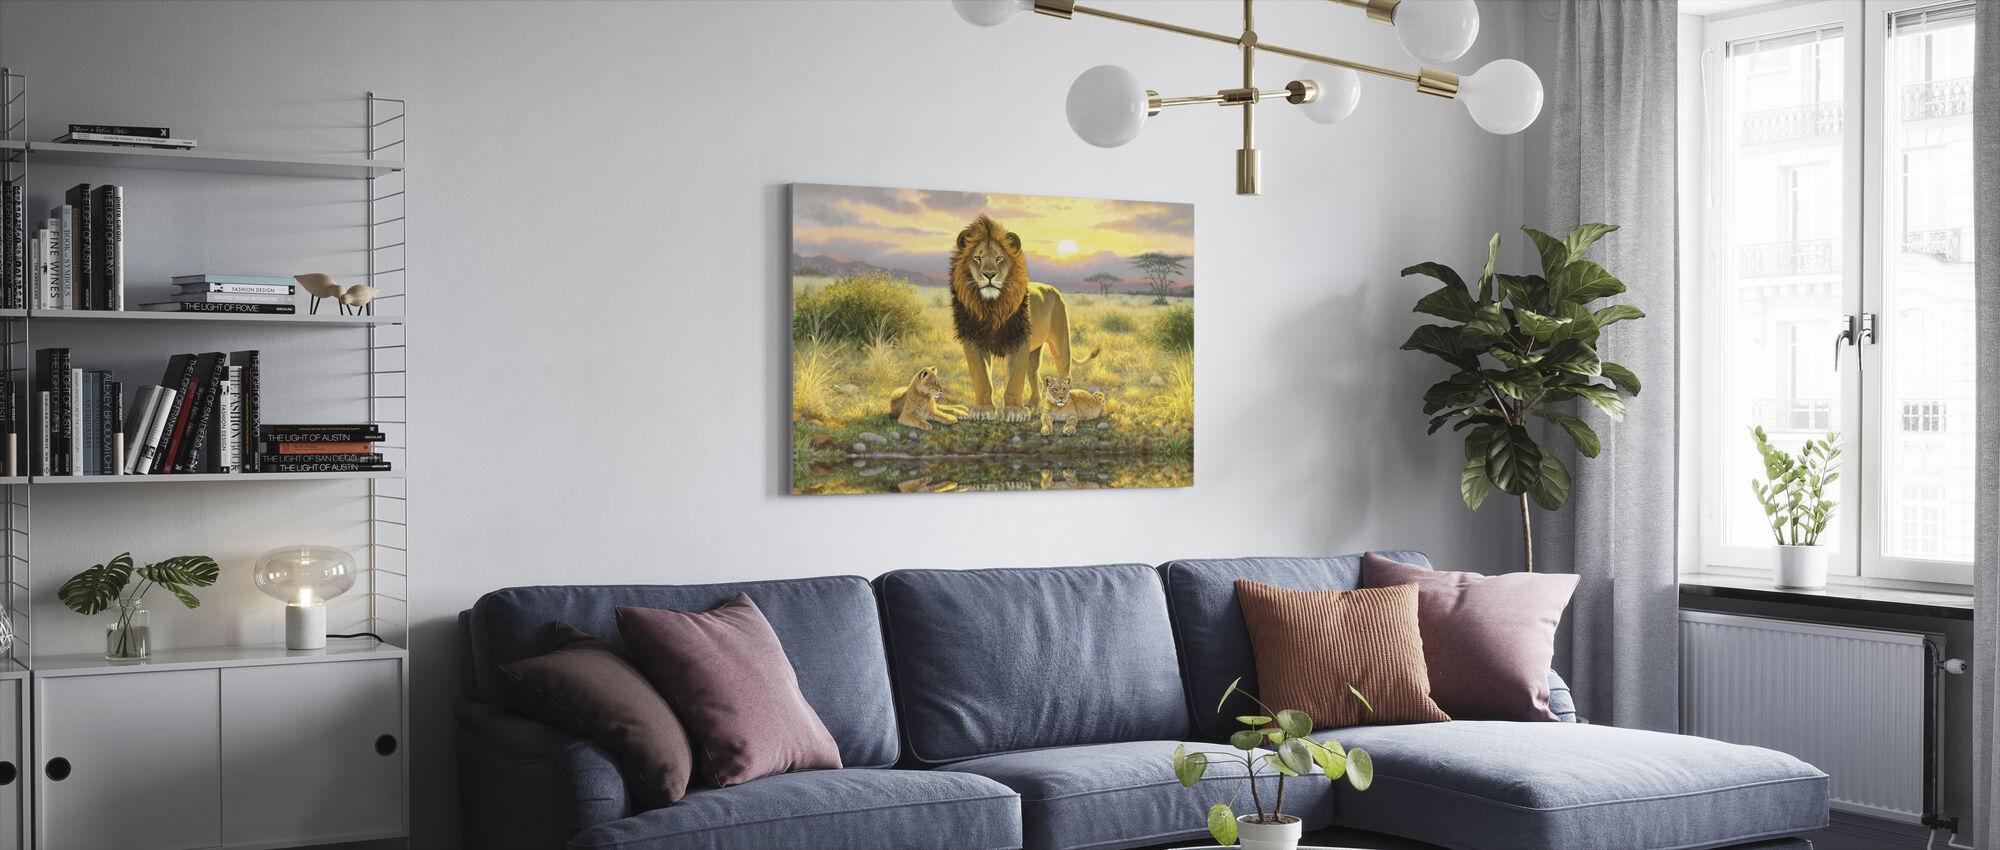 Lion and Twins Landscape - Canvas print - Living Room